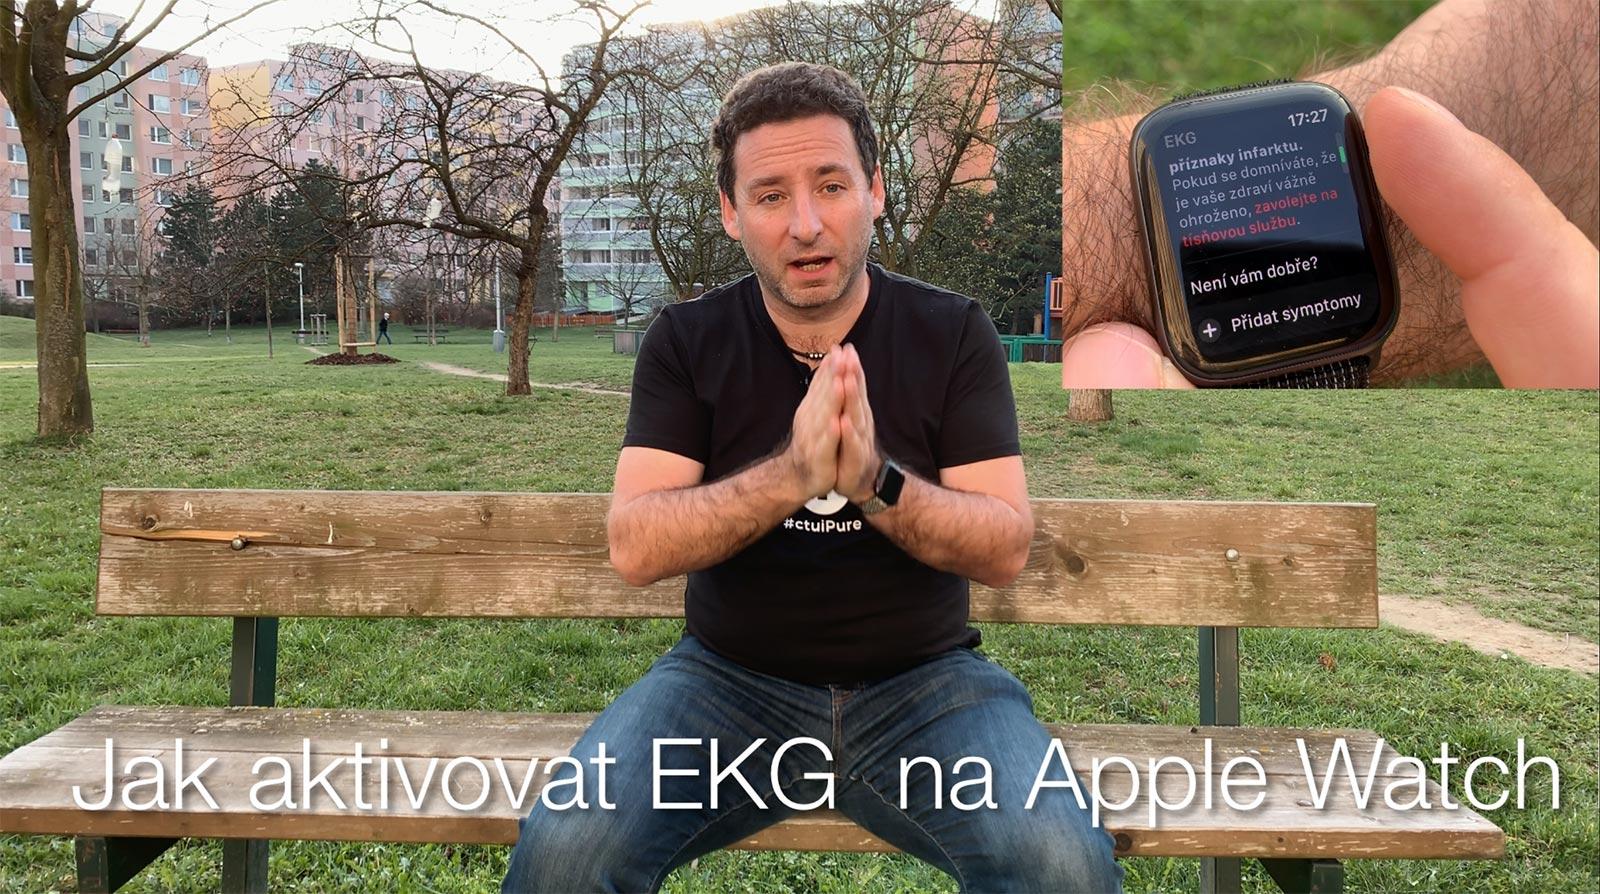 Jak aktivovat EKG na Apple Watch